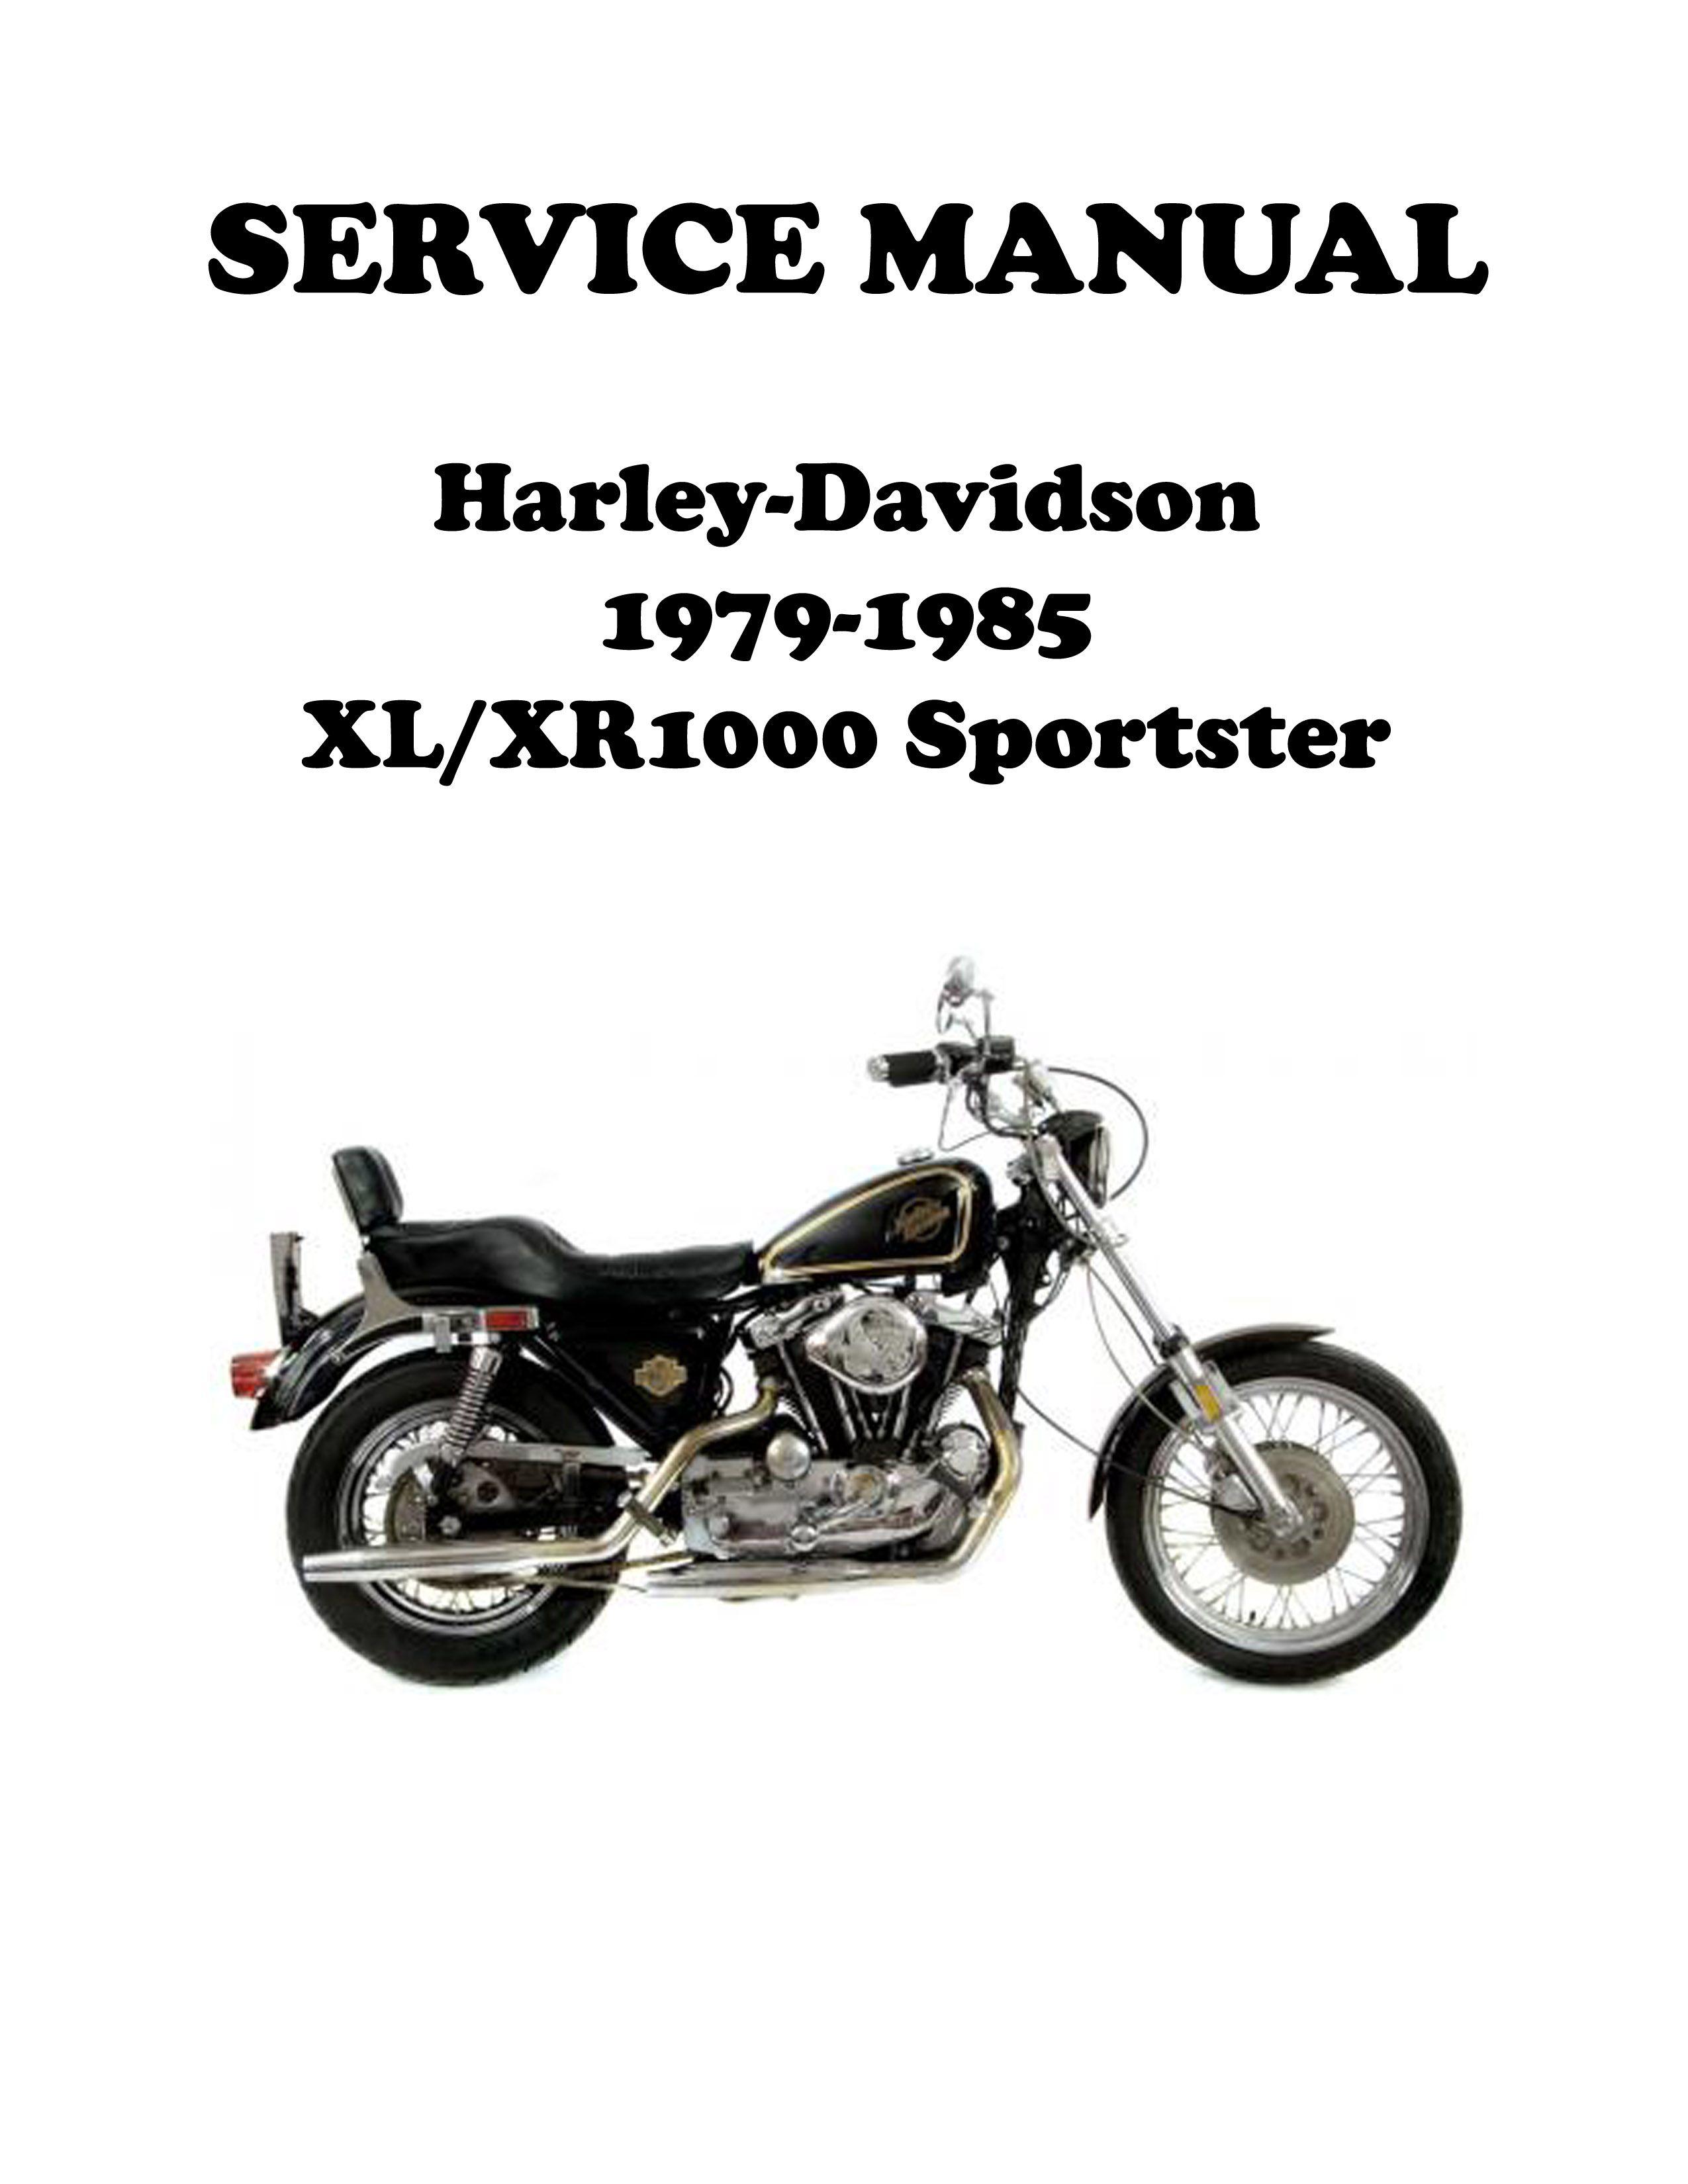 1979-1985 Harley Sportster Ironhead Repair Manual | Fixin ... on